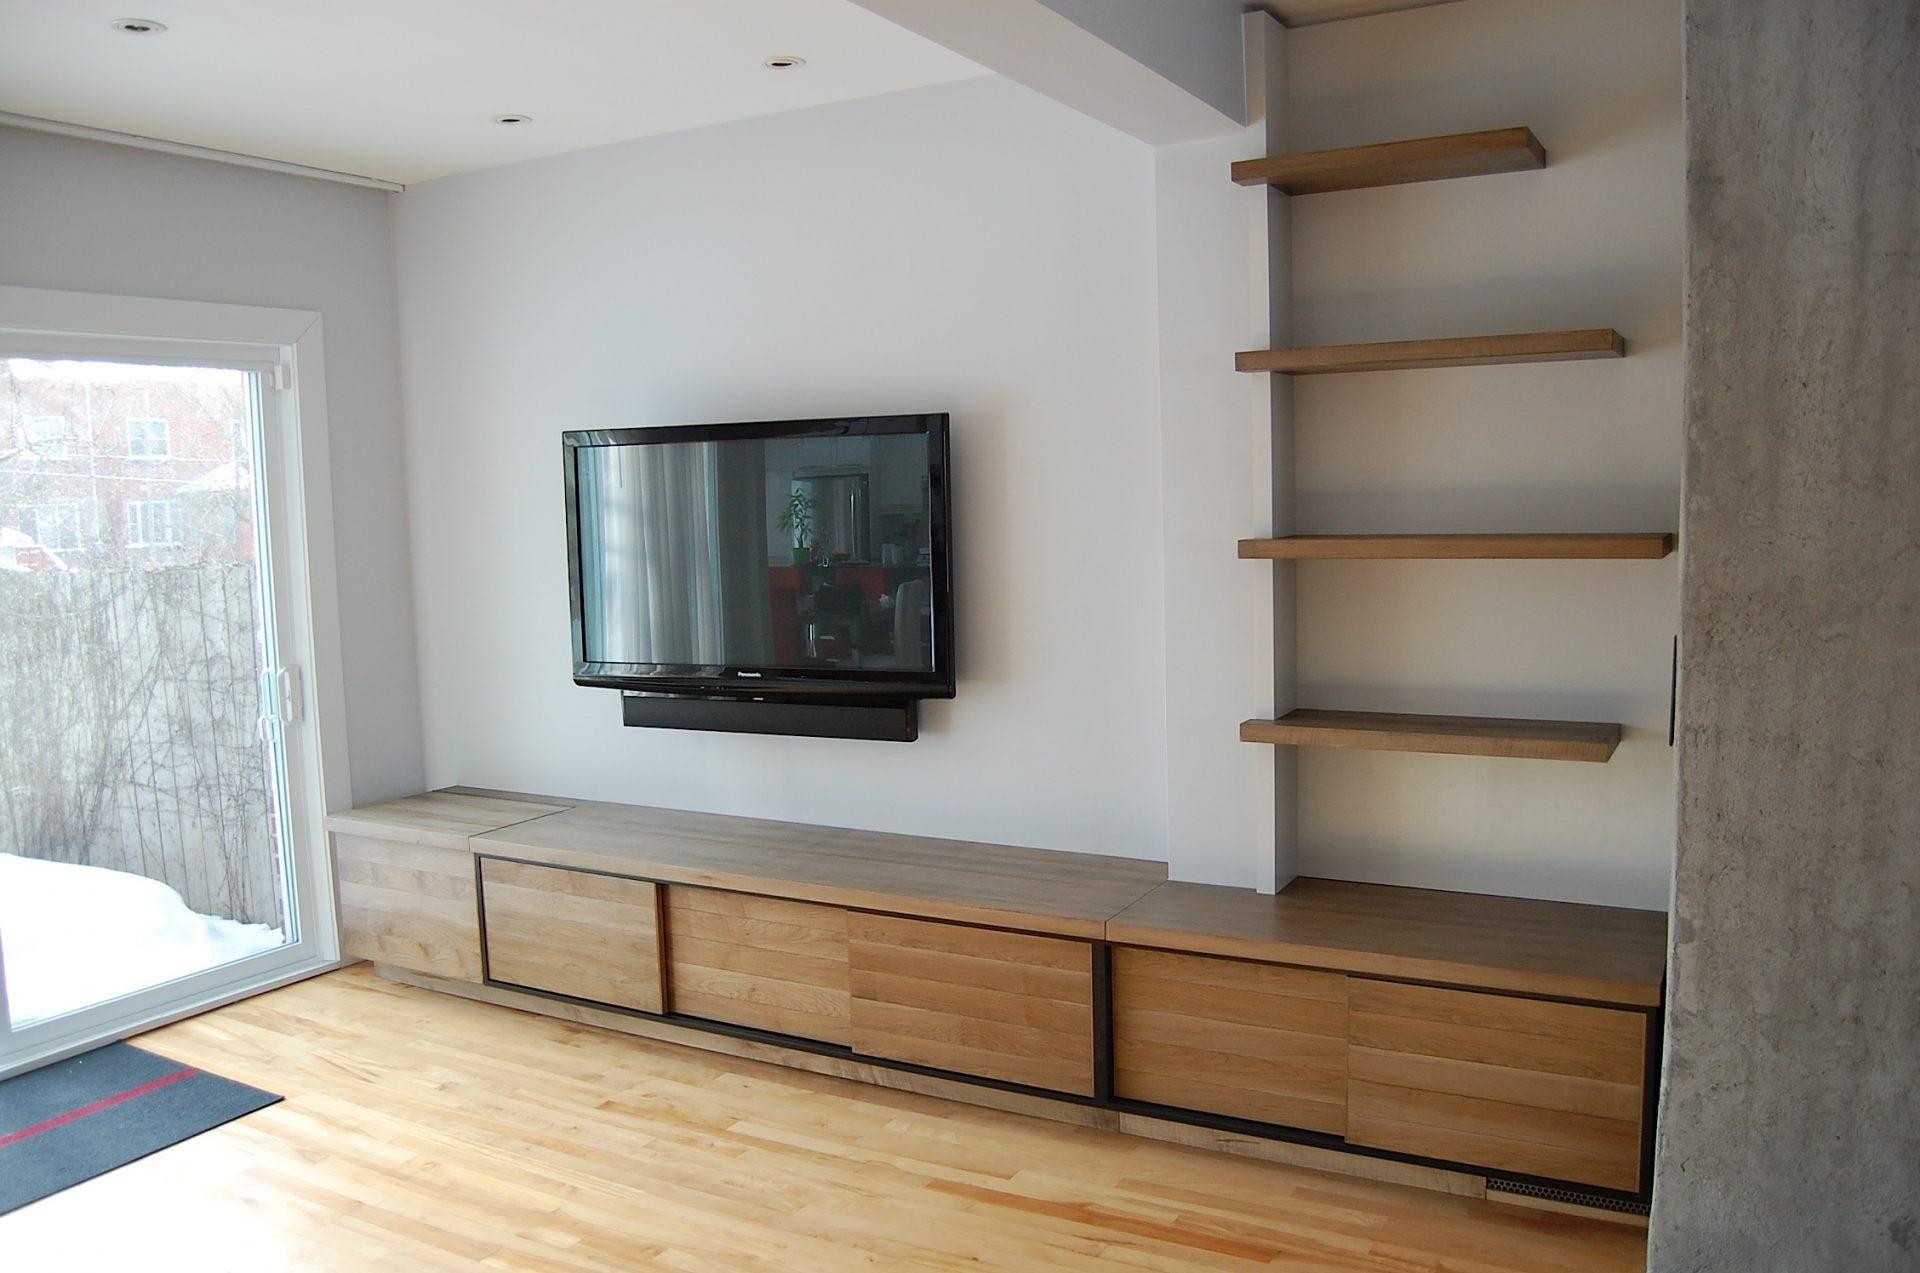 meubles salon design sur mesure jpg 2 matpel. Black Bedroom Furniture Sets. Home Design Ideas